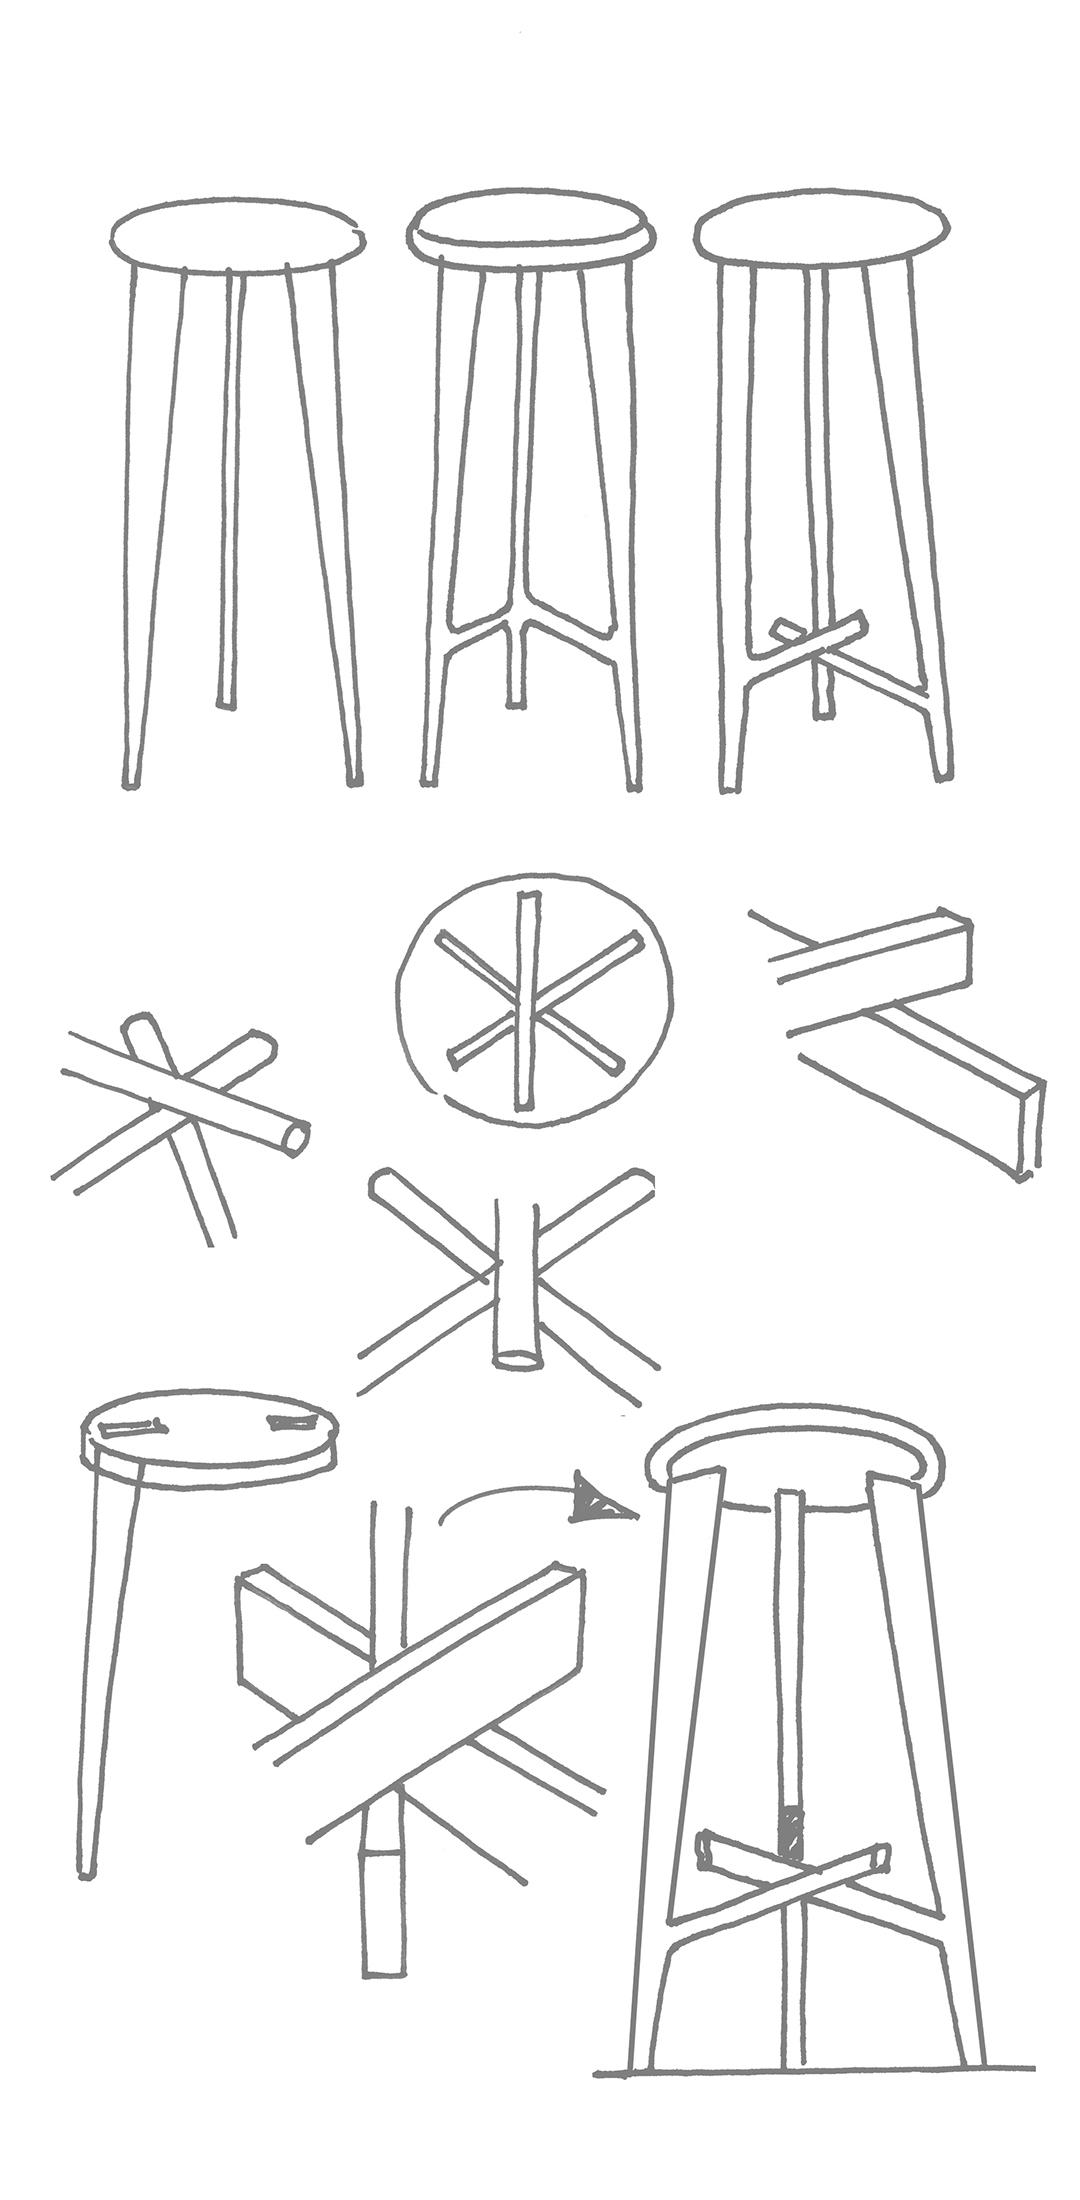 key stool sketches — soca